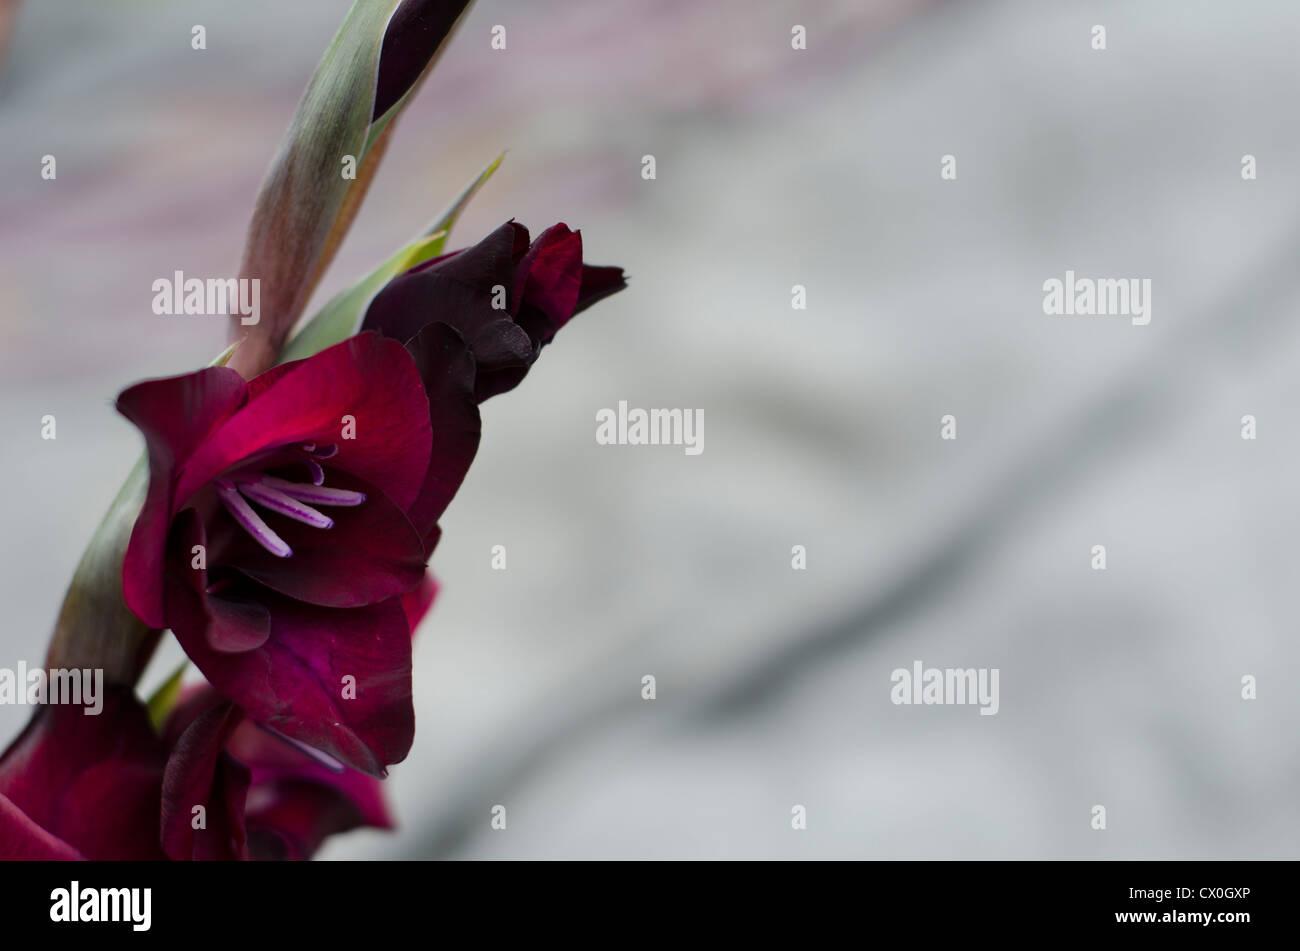 A stem of burgundy-crimson Gladiola - Gladiolus Iridaceae with soft, grey background - Stock Image